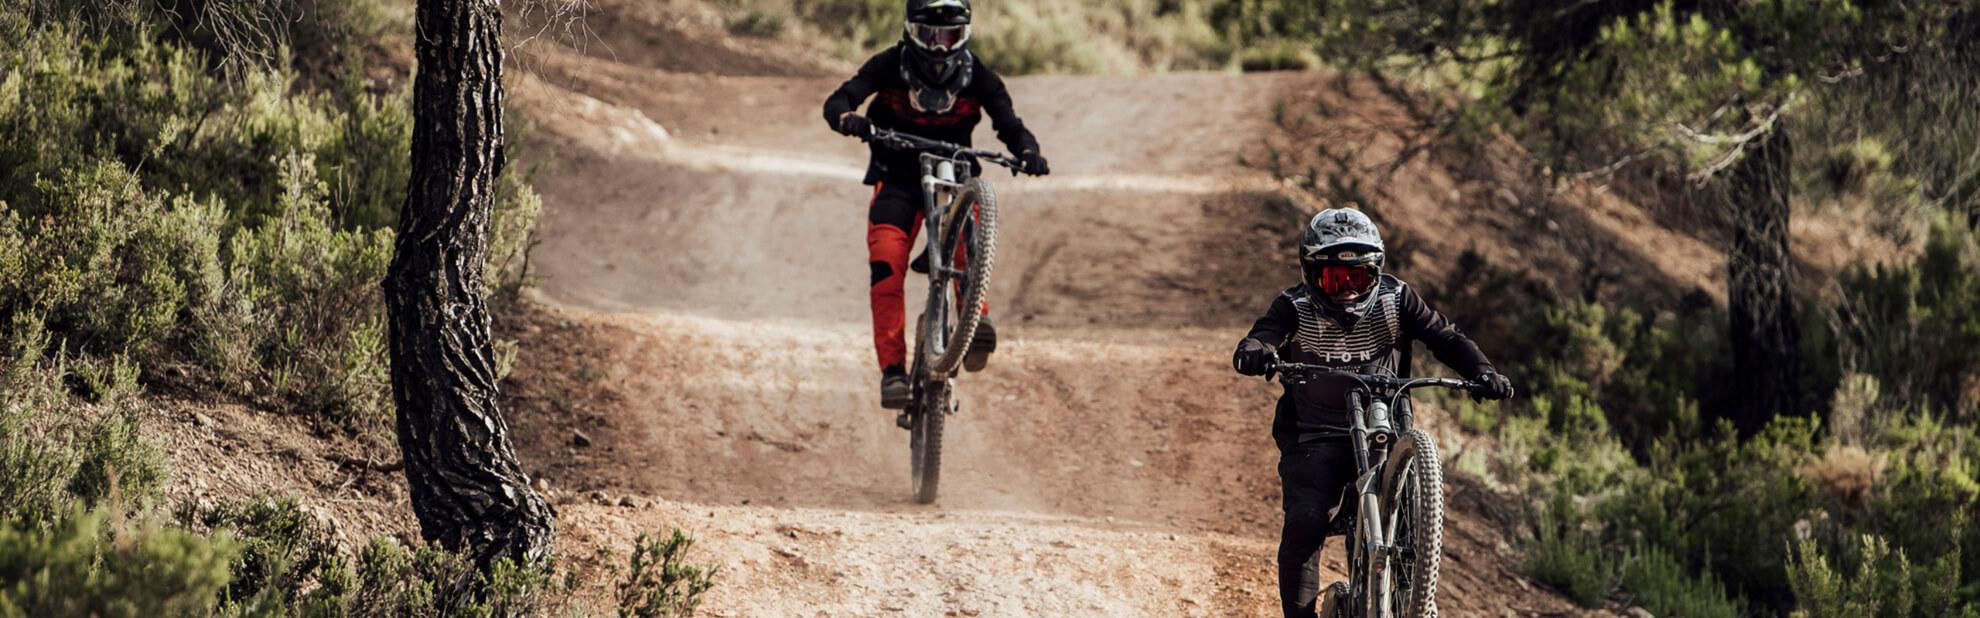 ION bie Bikester